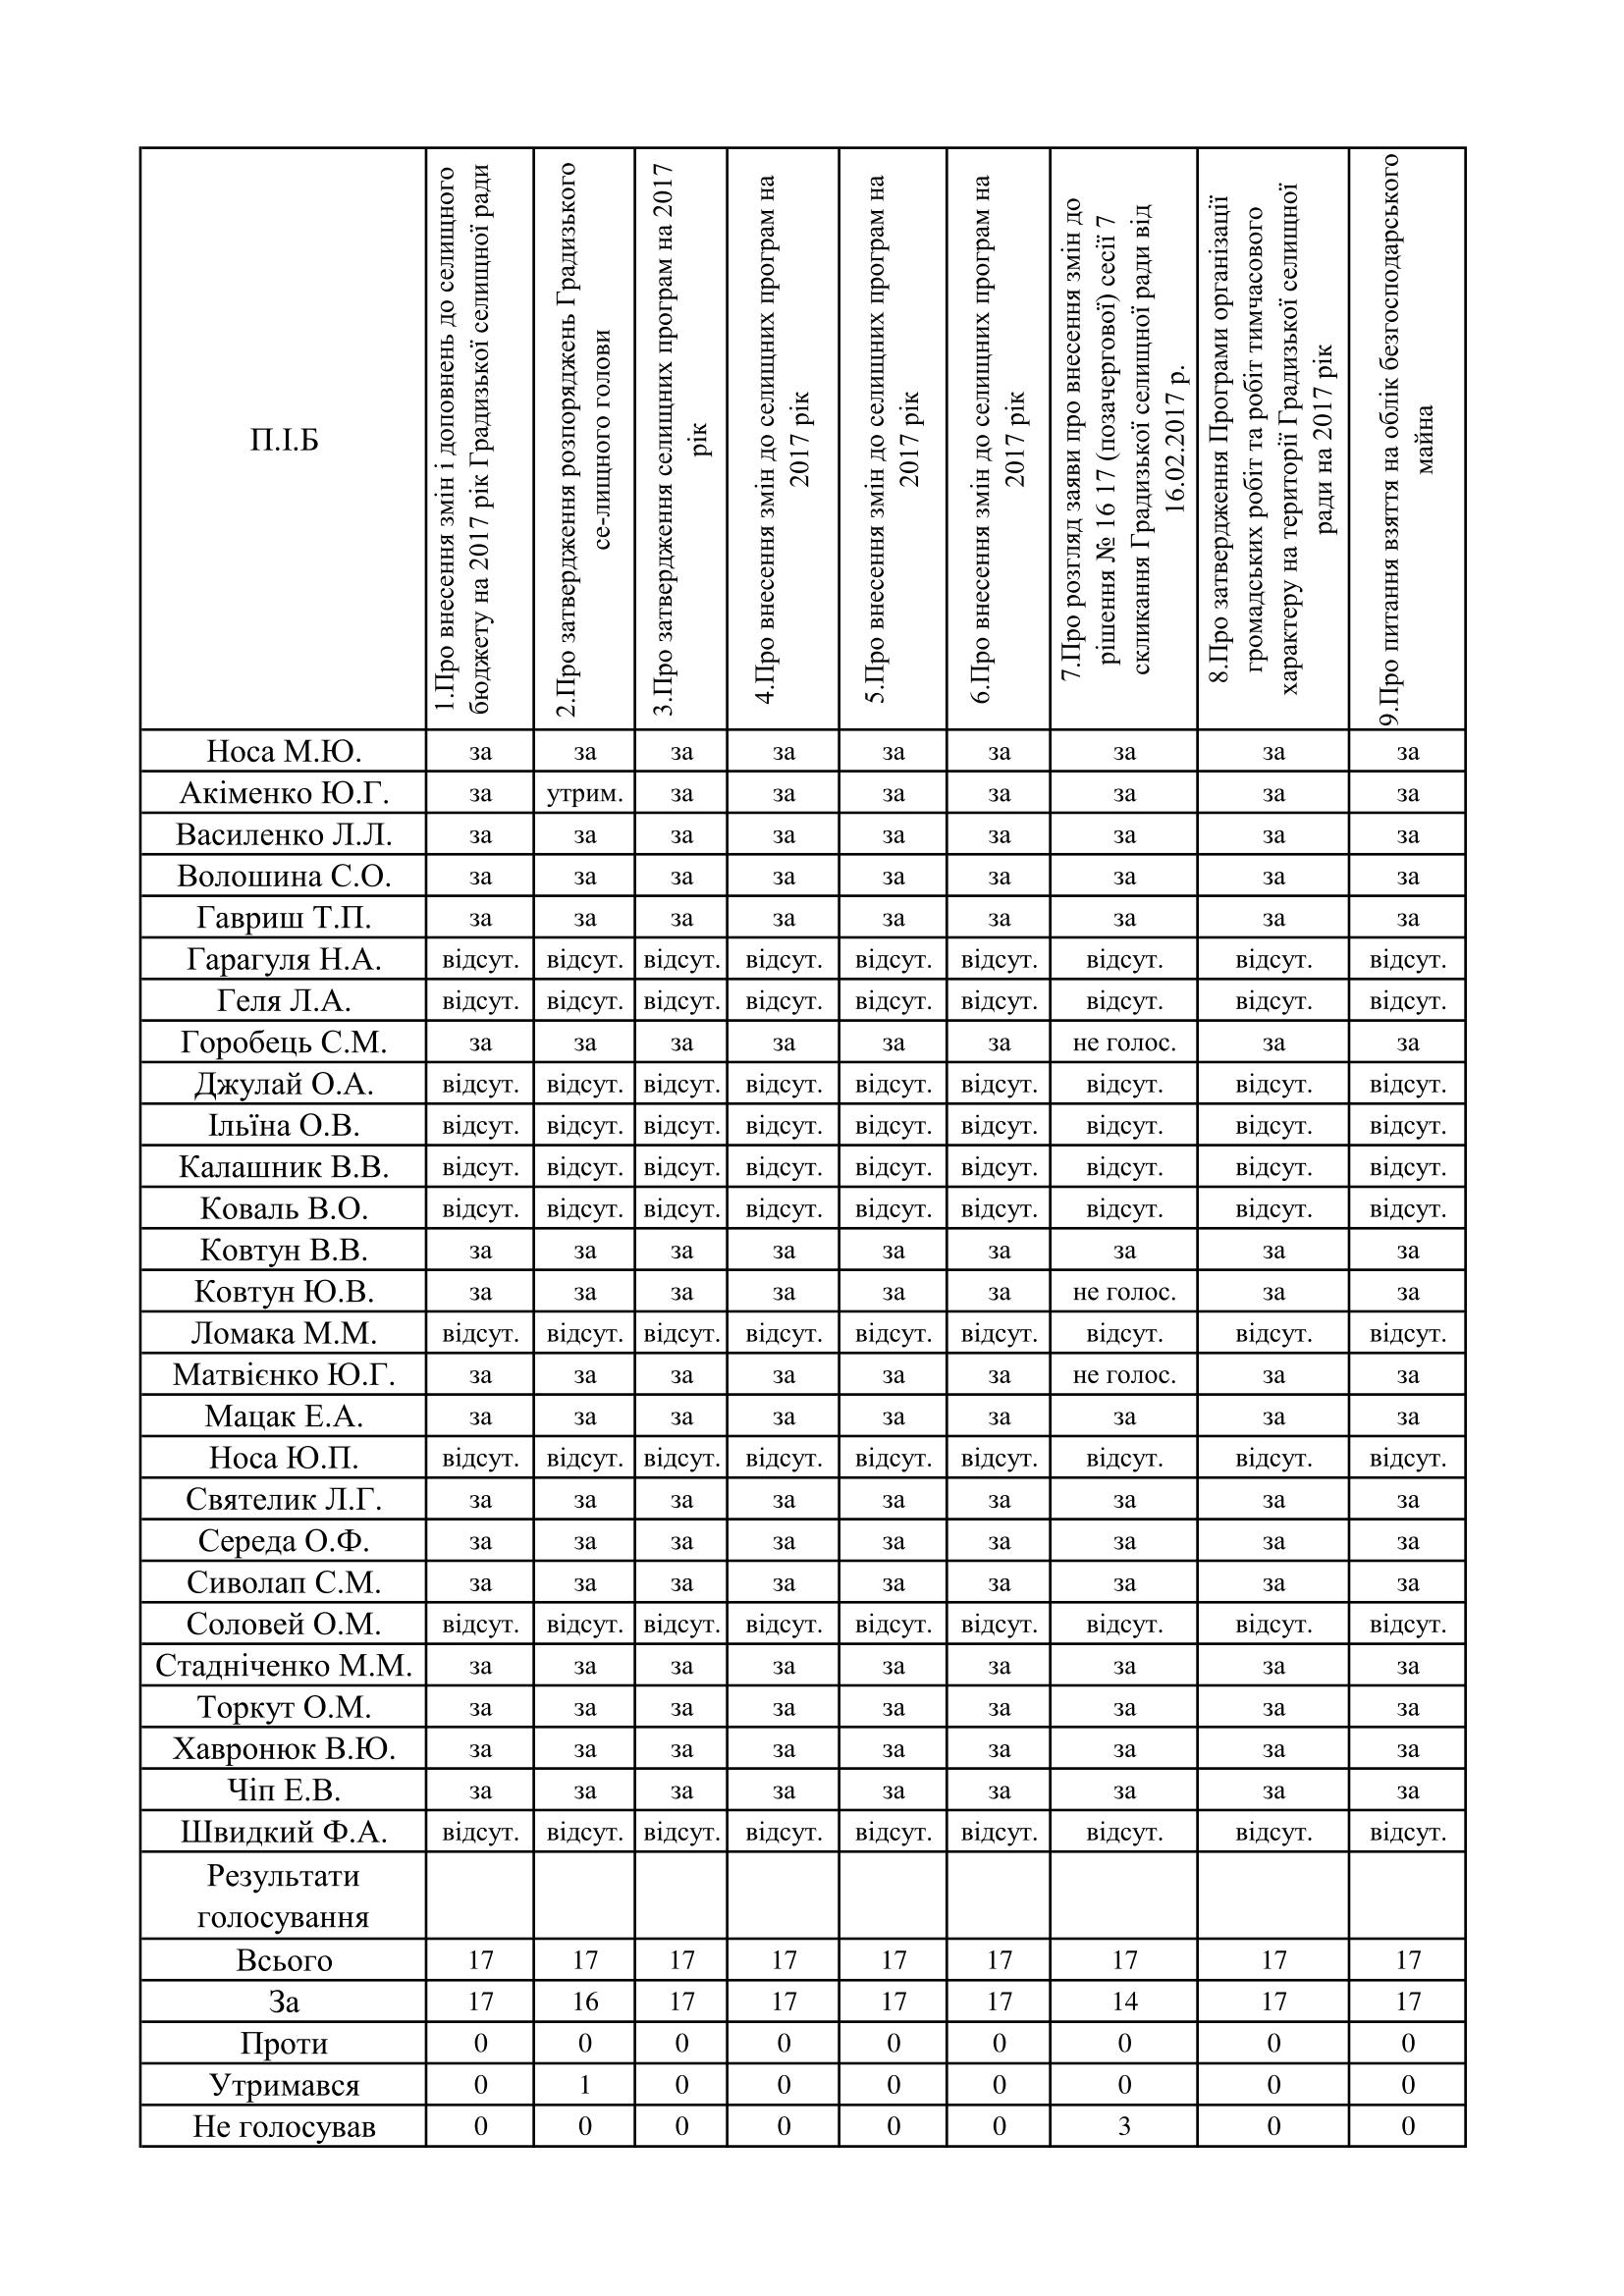 http://gradizka-rada.gov.ua/wp-content/uploads/2017/03/поіменне-голосування-1.png